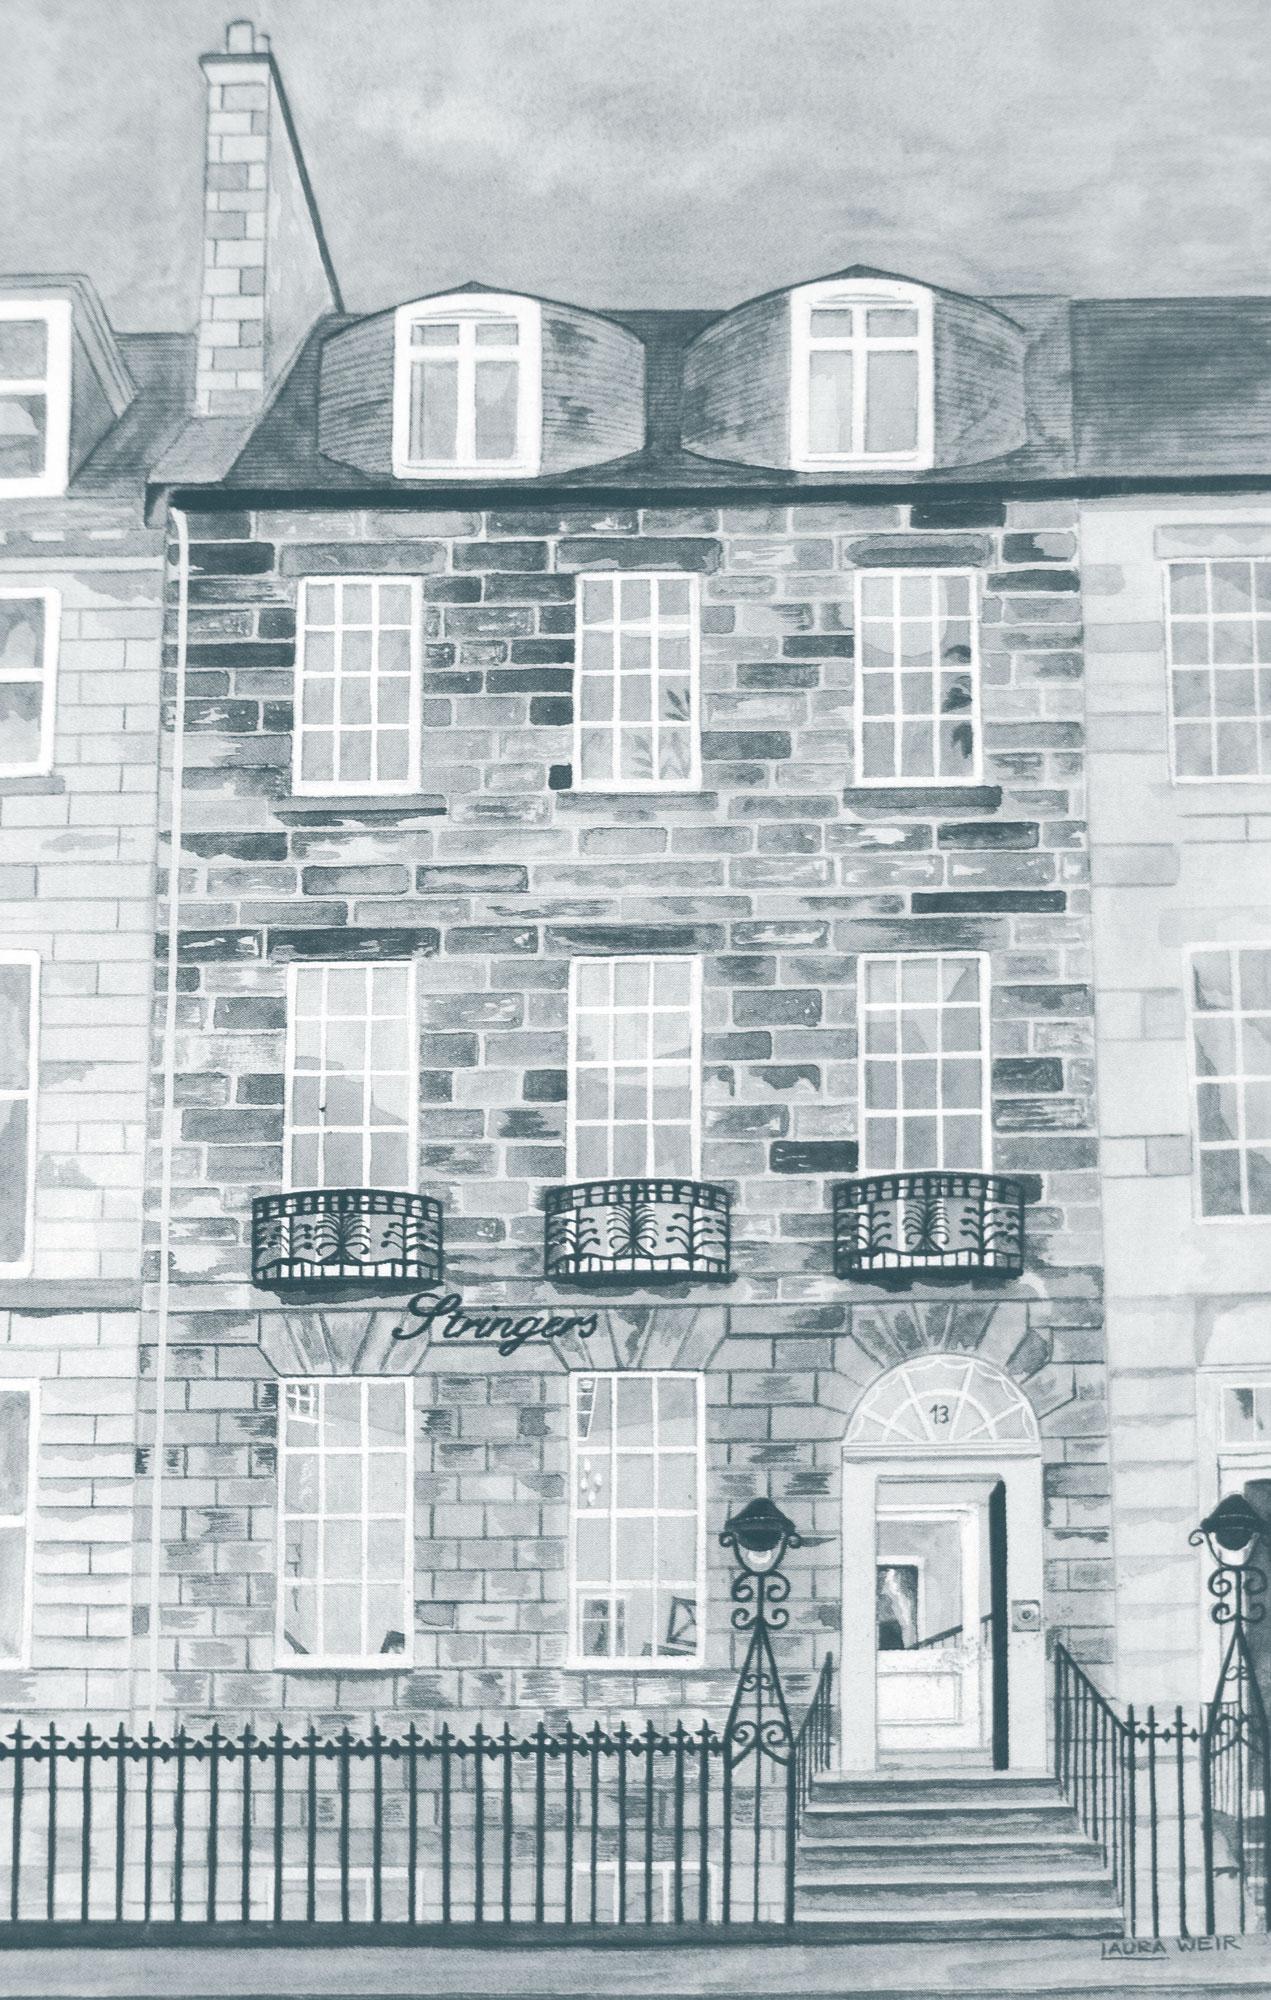 York Place, Edinburgh